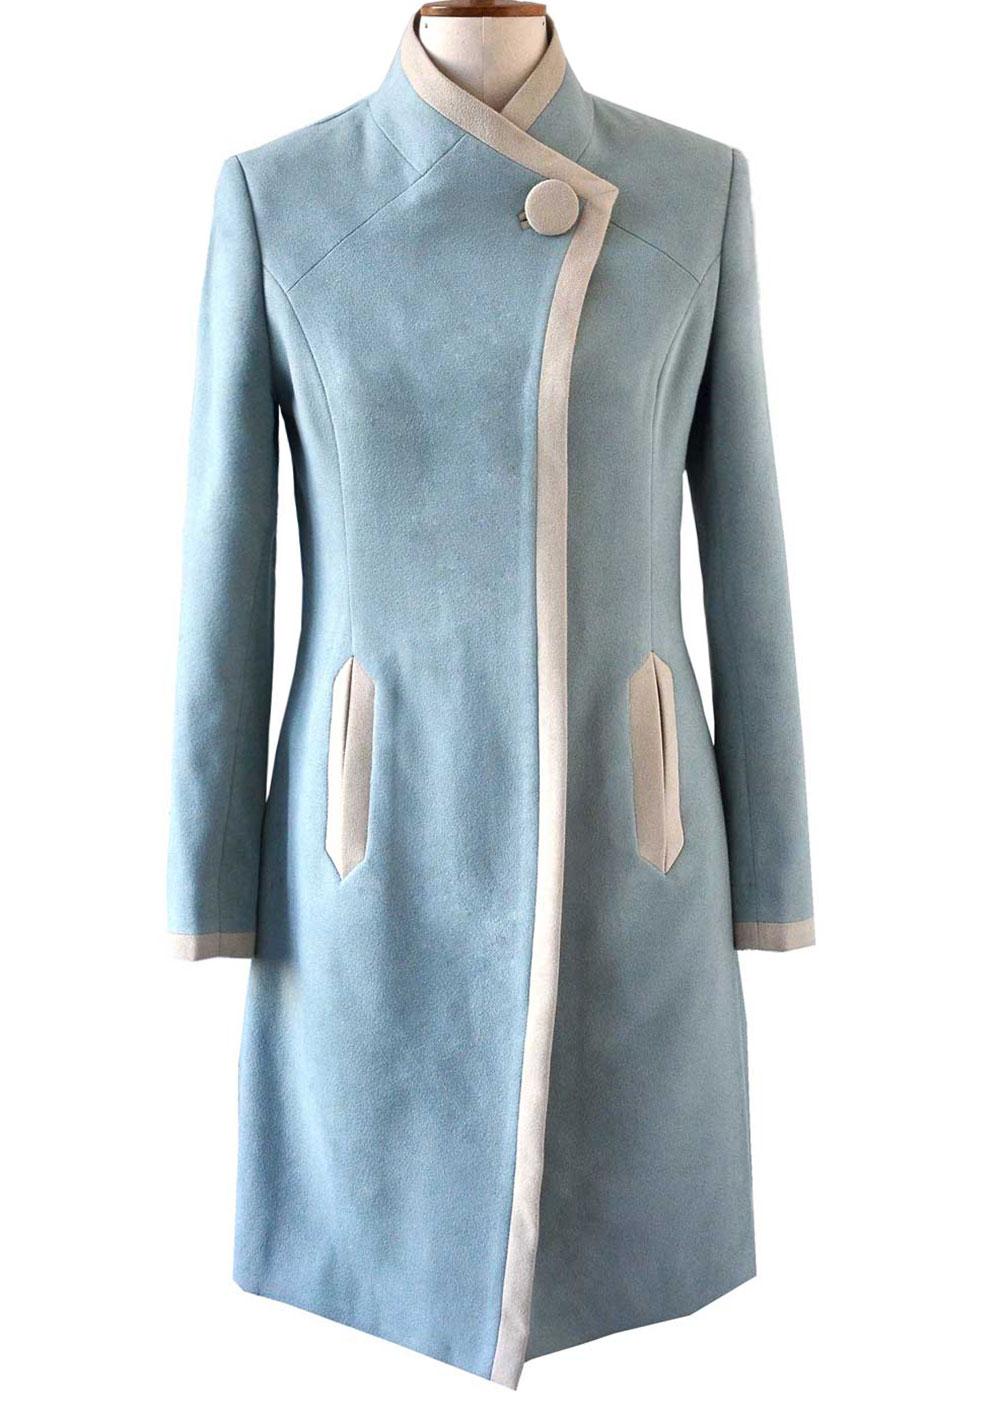 light-blue-winter-coat-a